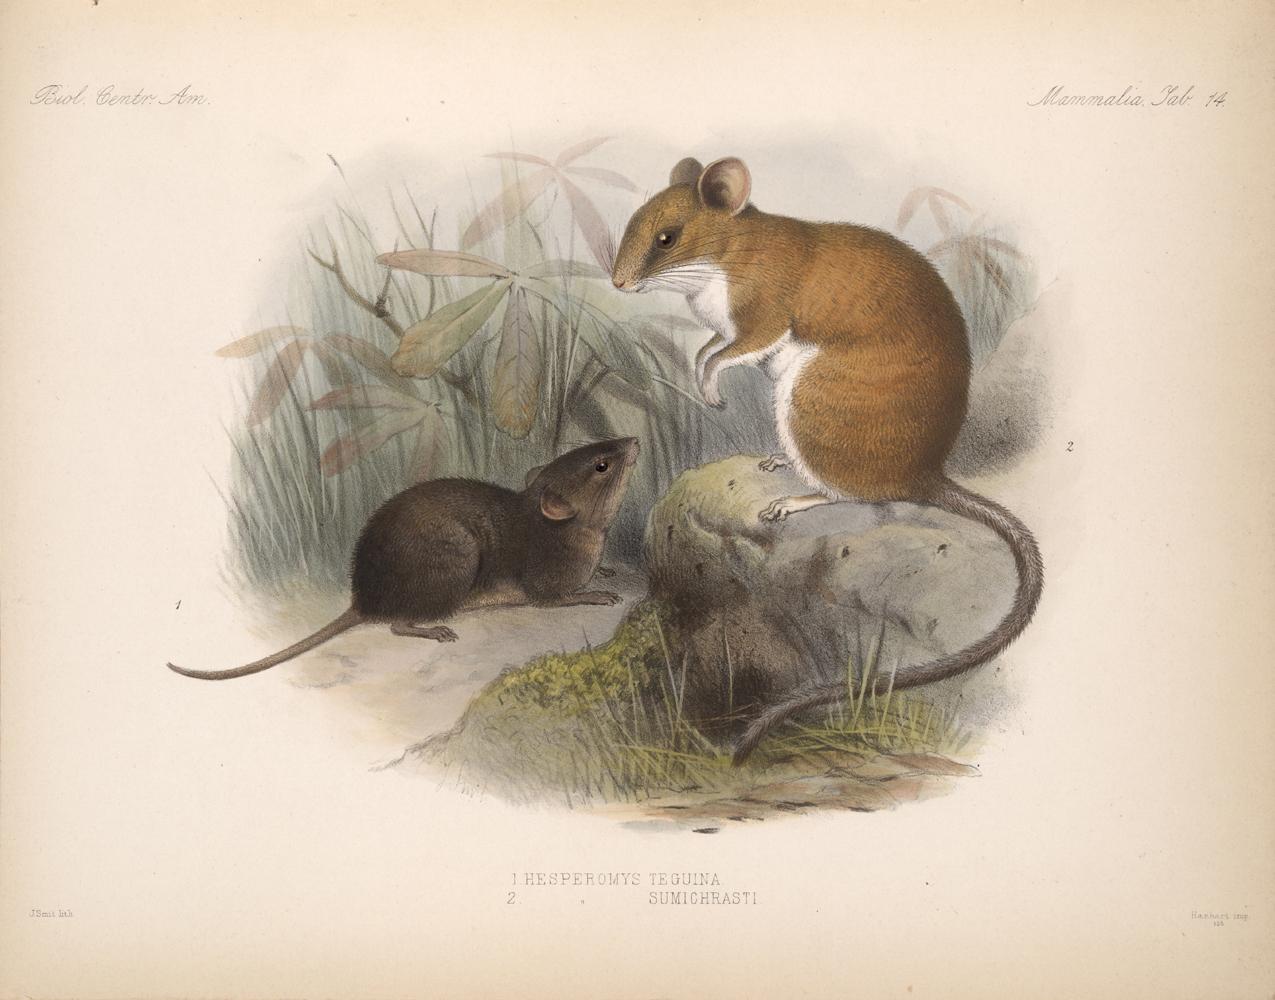 Mammals,  Image number:bca_02_00_00_275